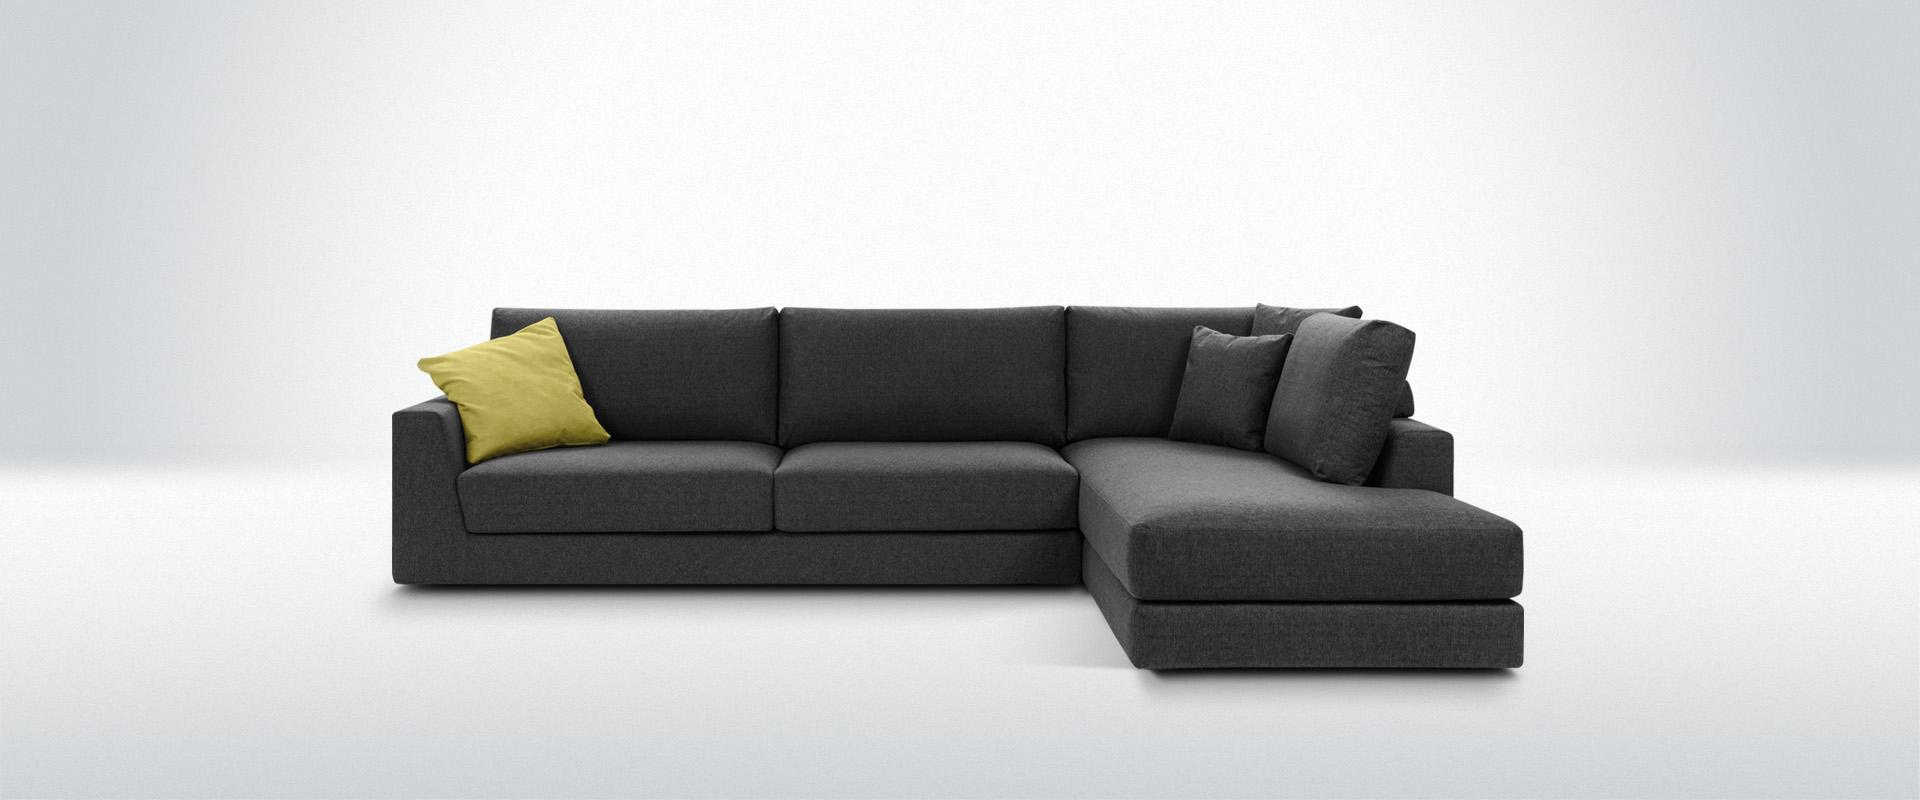 big sofa berlin 30 delightful big sofa berlin photographs big sofa berlin kaufen iwaniccy big. Black Bedroom Furniture Sets. Home Design Ideas